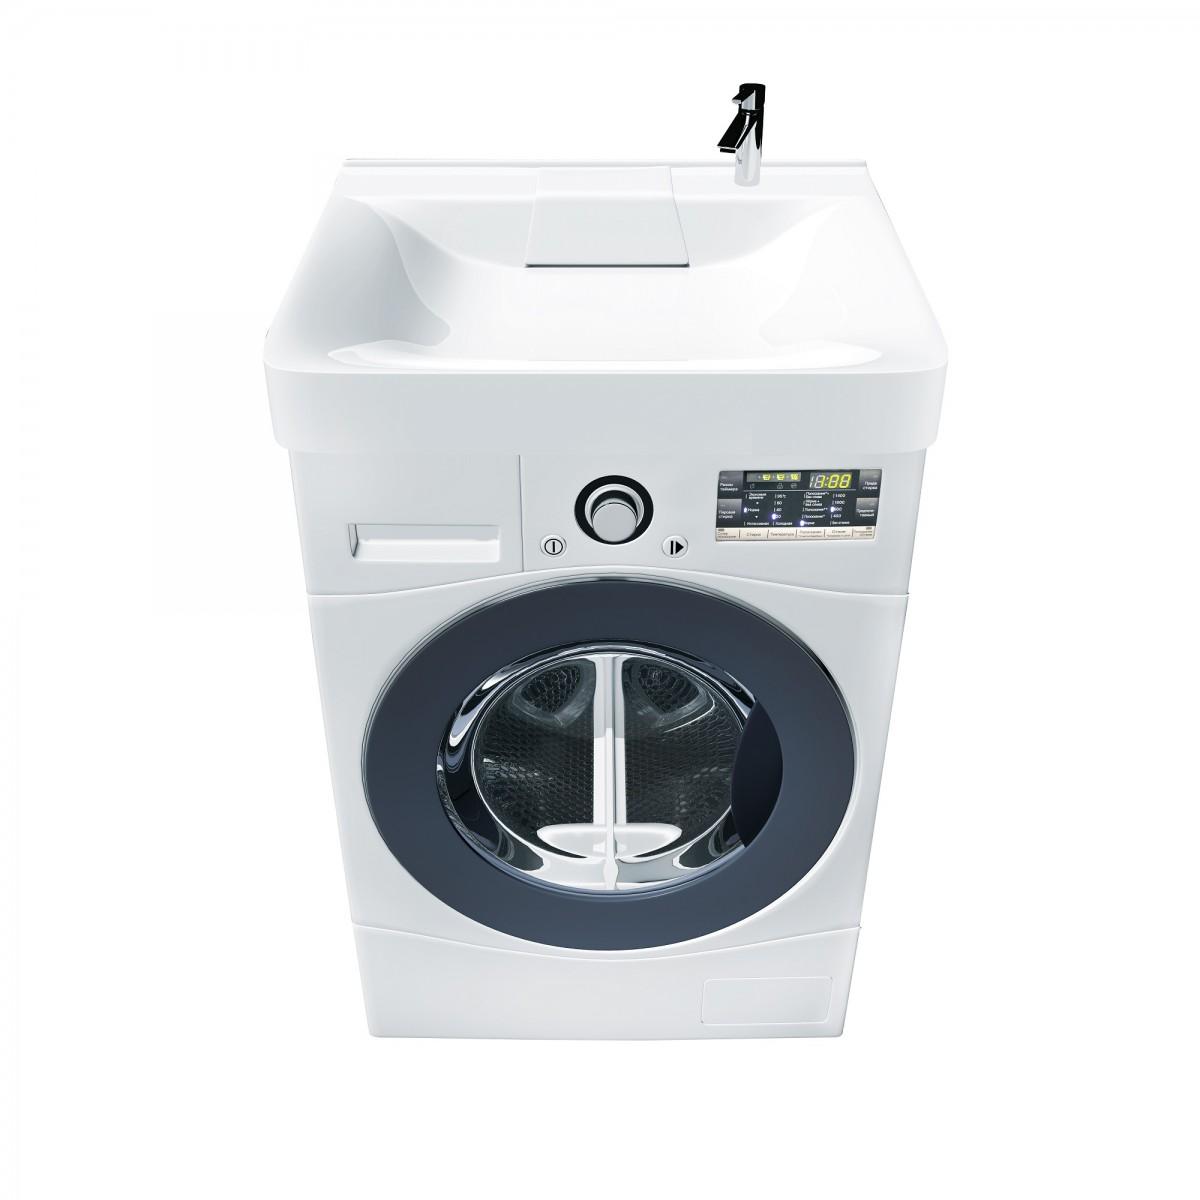 Раковина Marka One Laundry 60x60 на стиральную машину